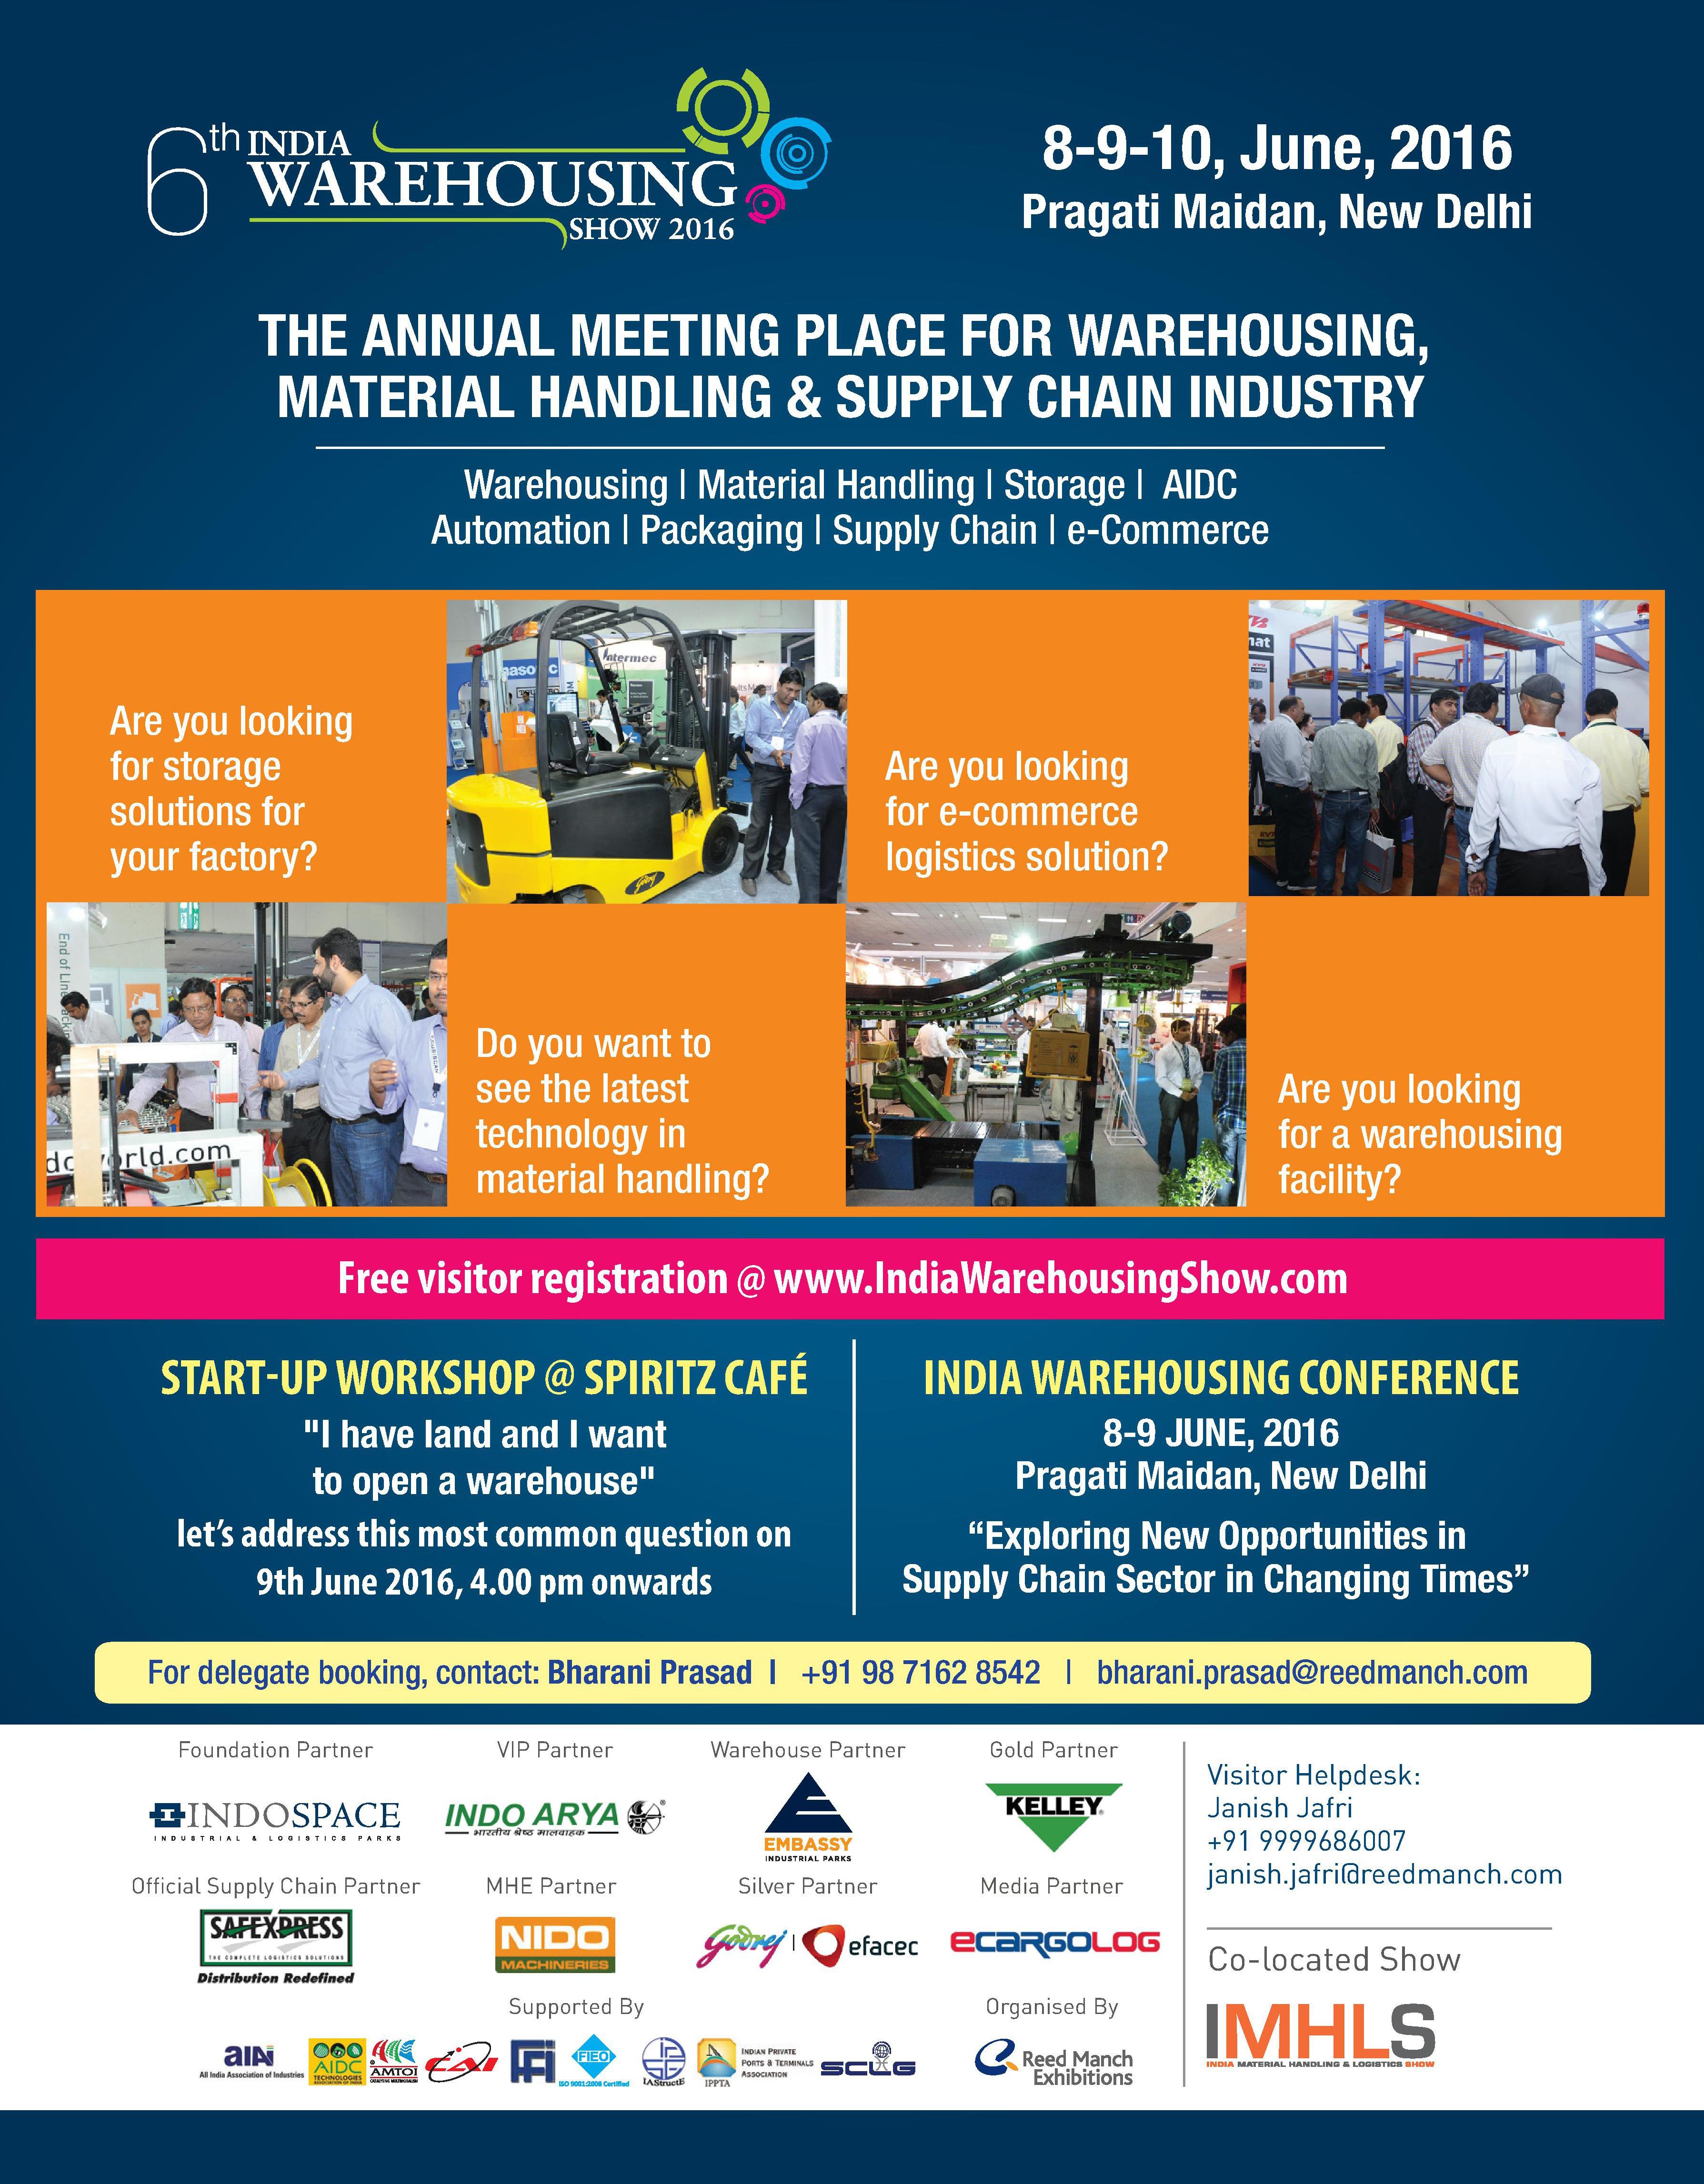 6th India Warehousing Show 2016